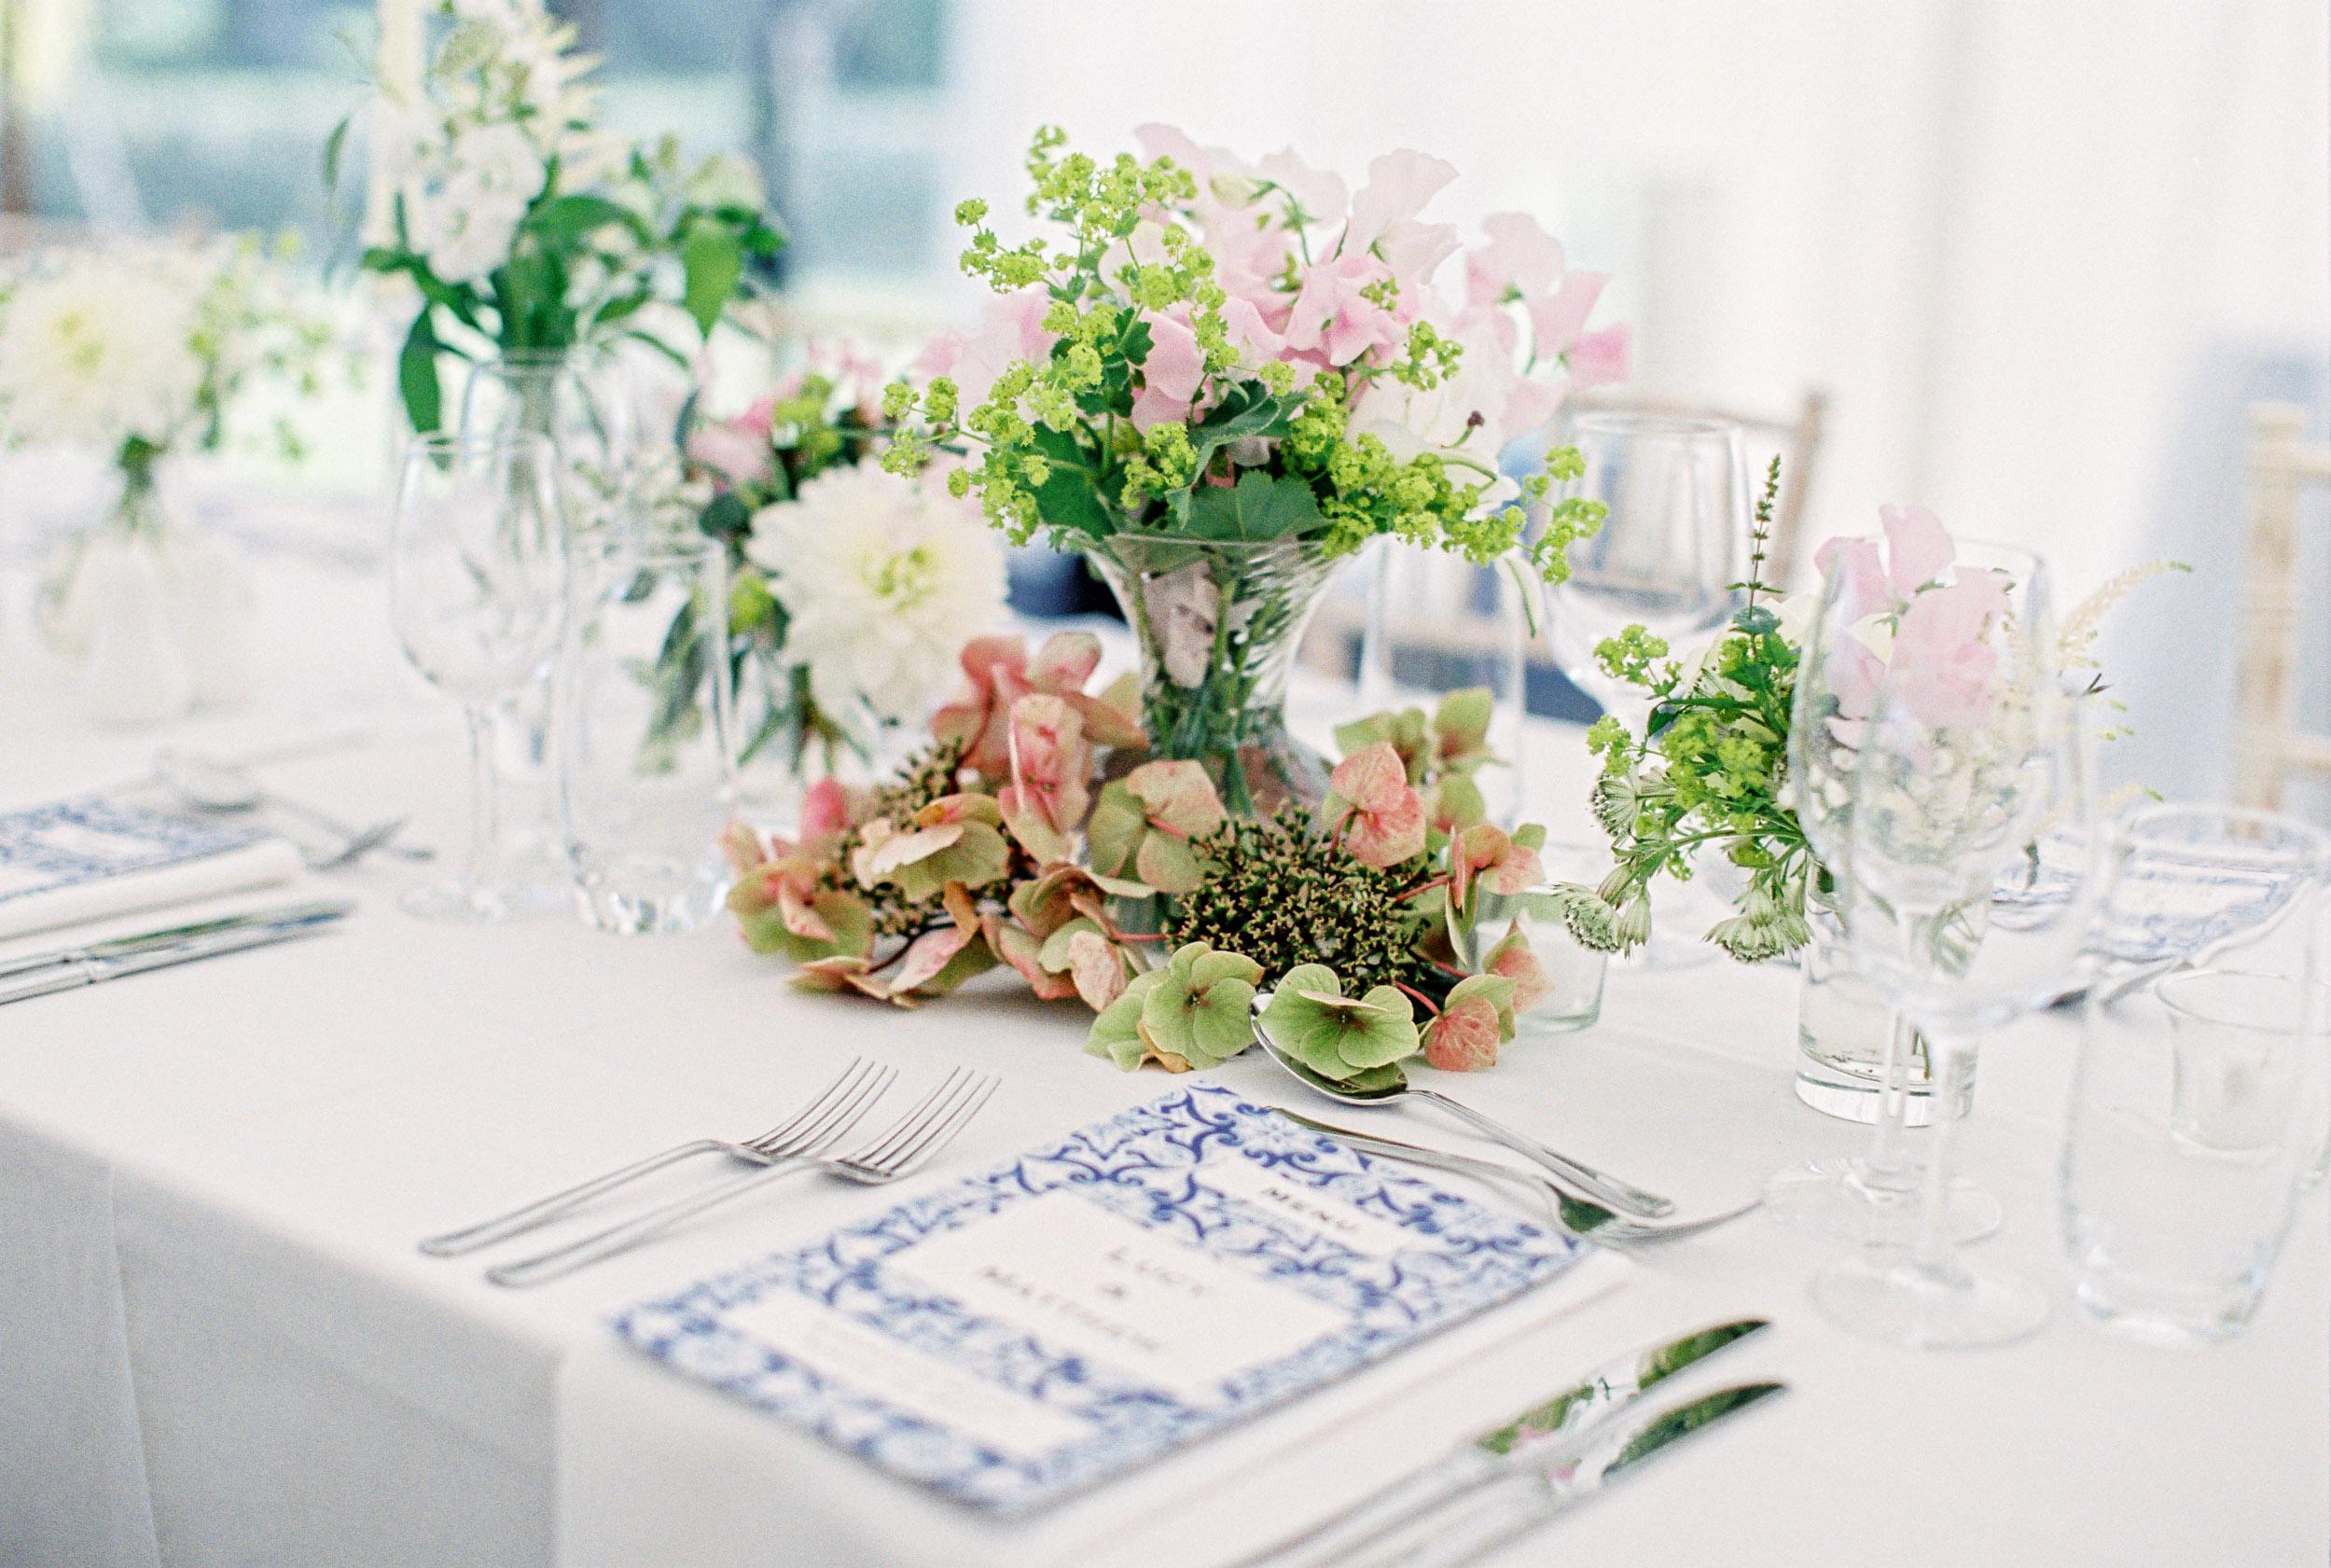 Liz Baker Fine Art Photography Emma Joy The Wedding Planner 1.jpg